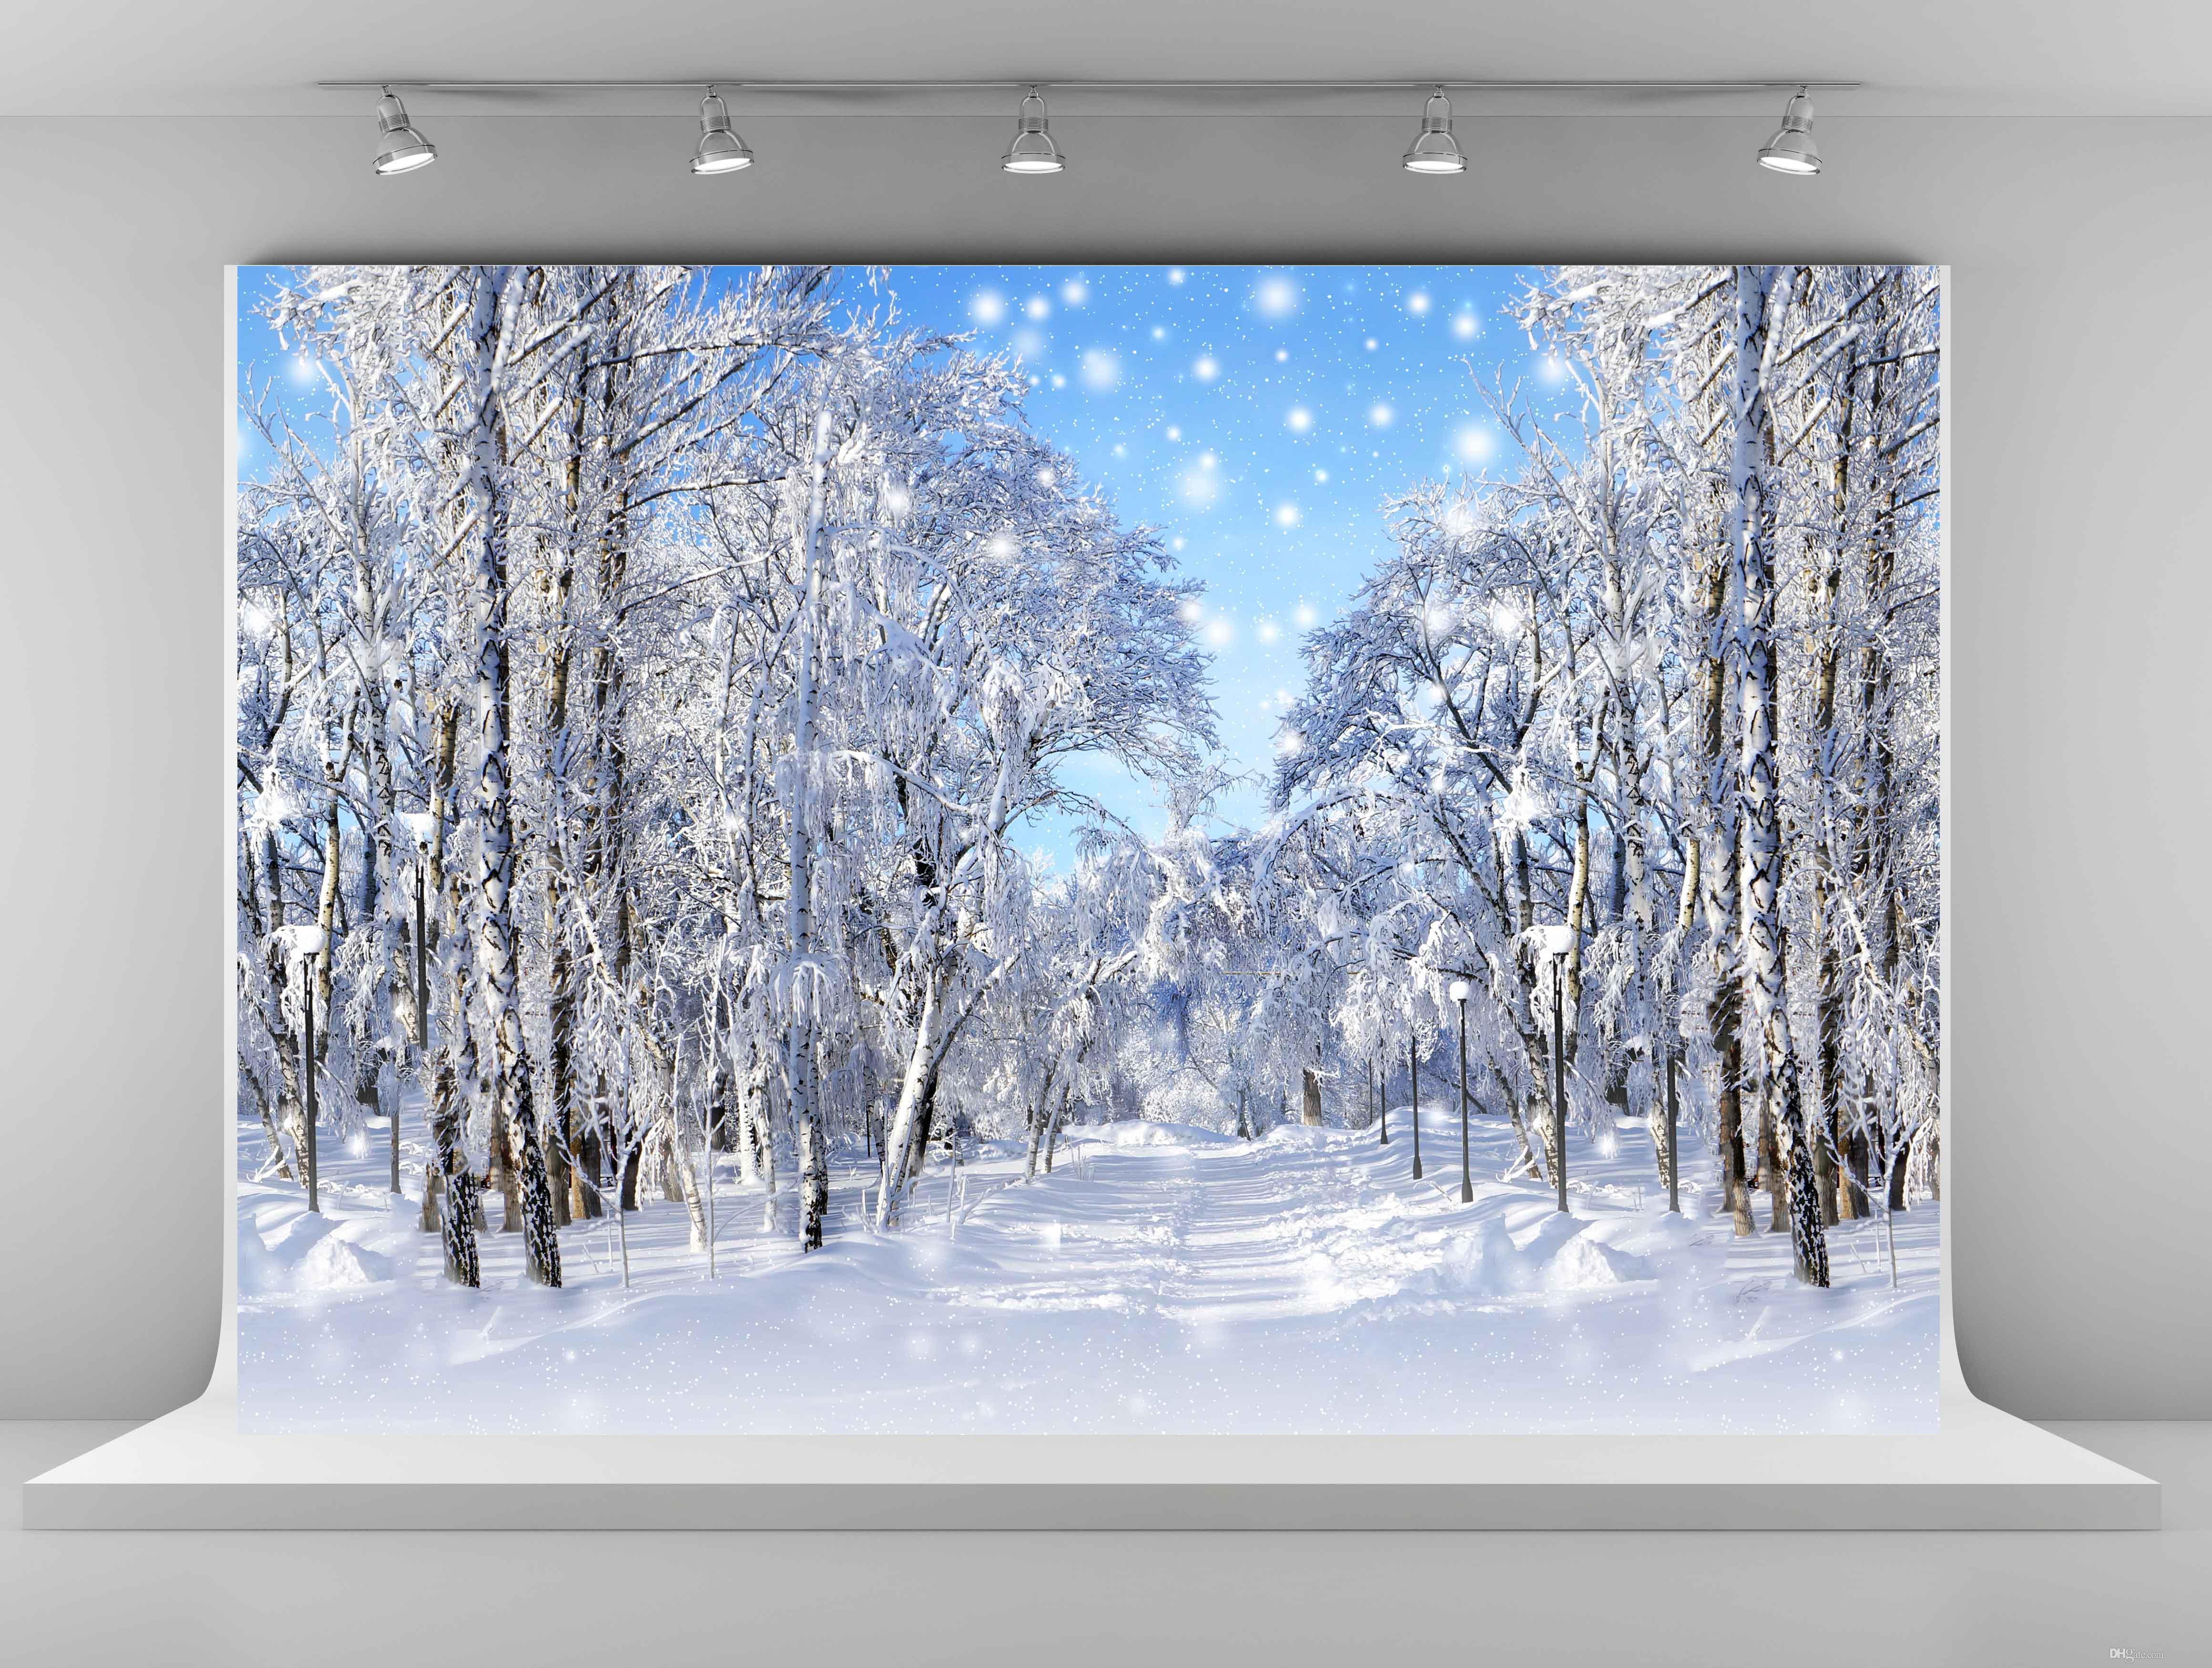 Sfondi Natalizi Innevati.Fondali Fotografia Invernale Sfondi Neve Congelata Per Photo Studio 7x5ft Albero Sfondi Natalizi Riprese Per Matrimonio